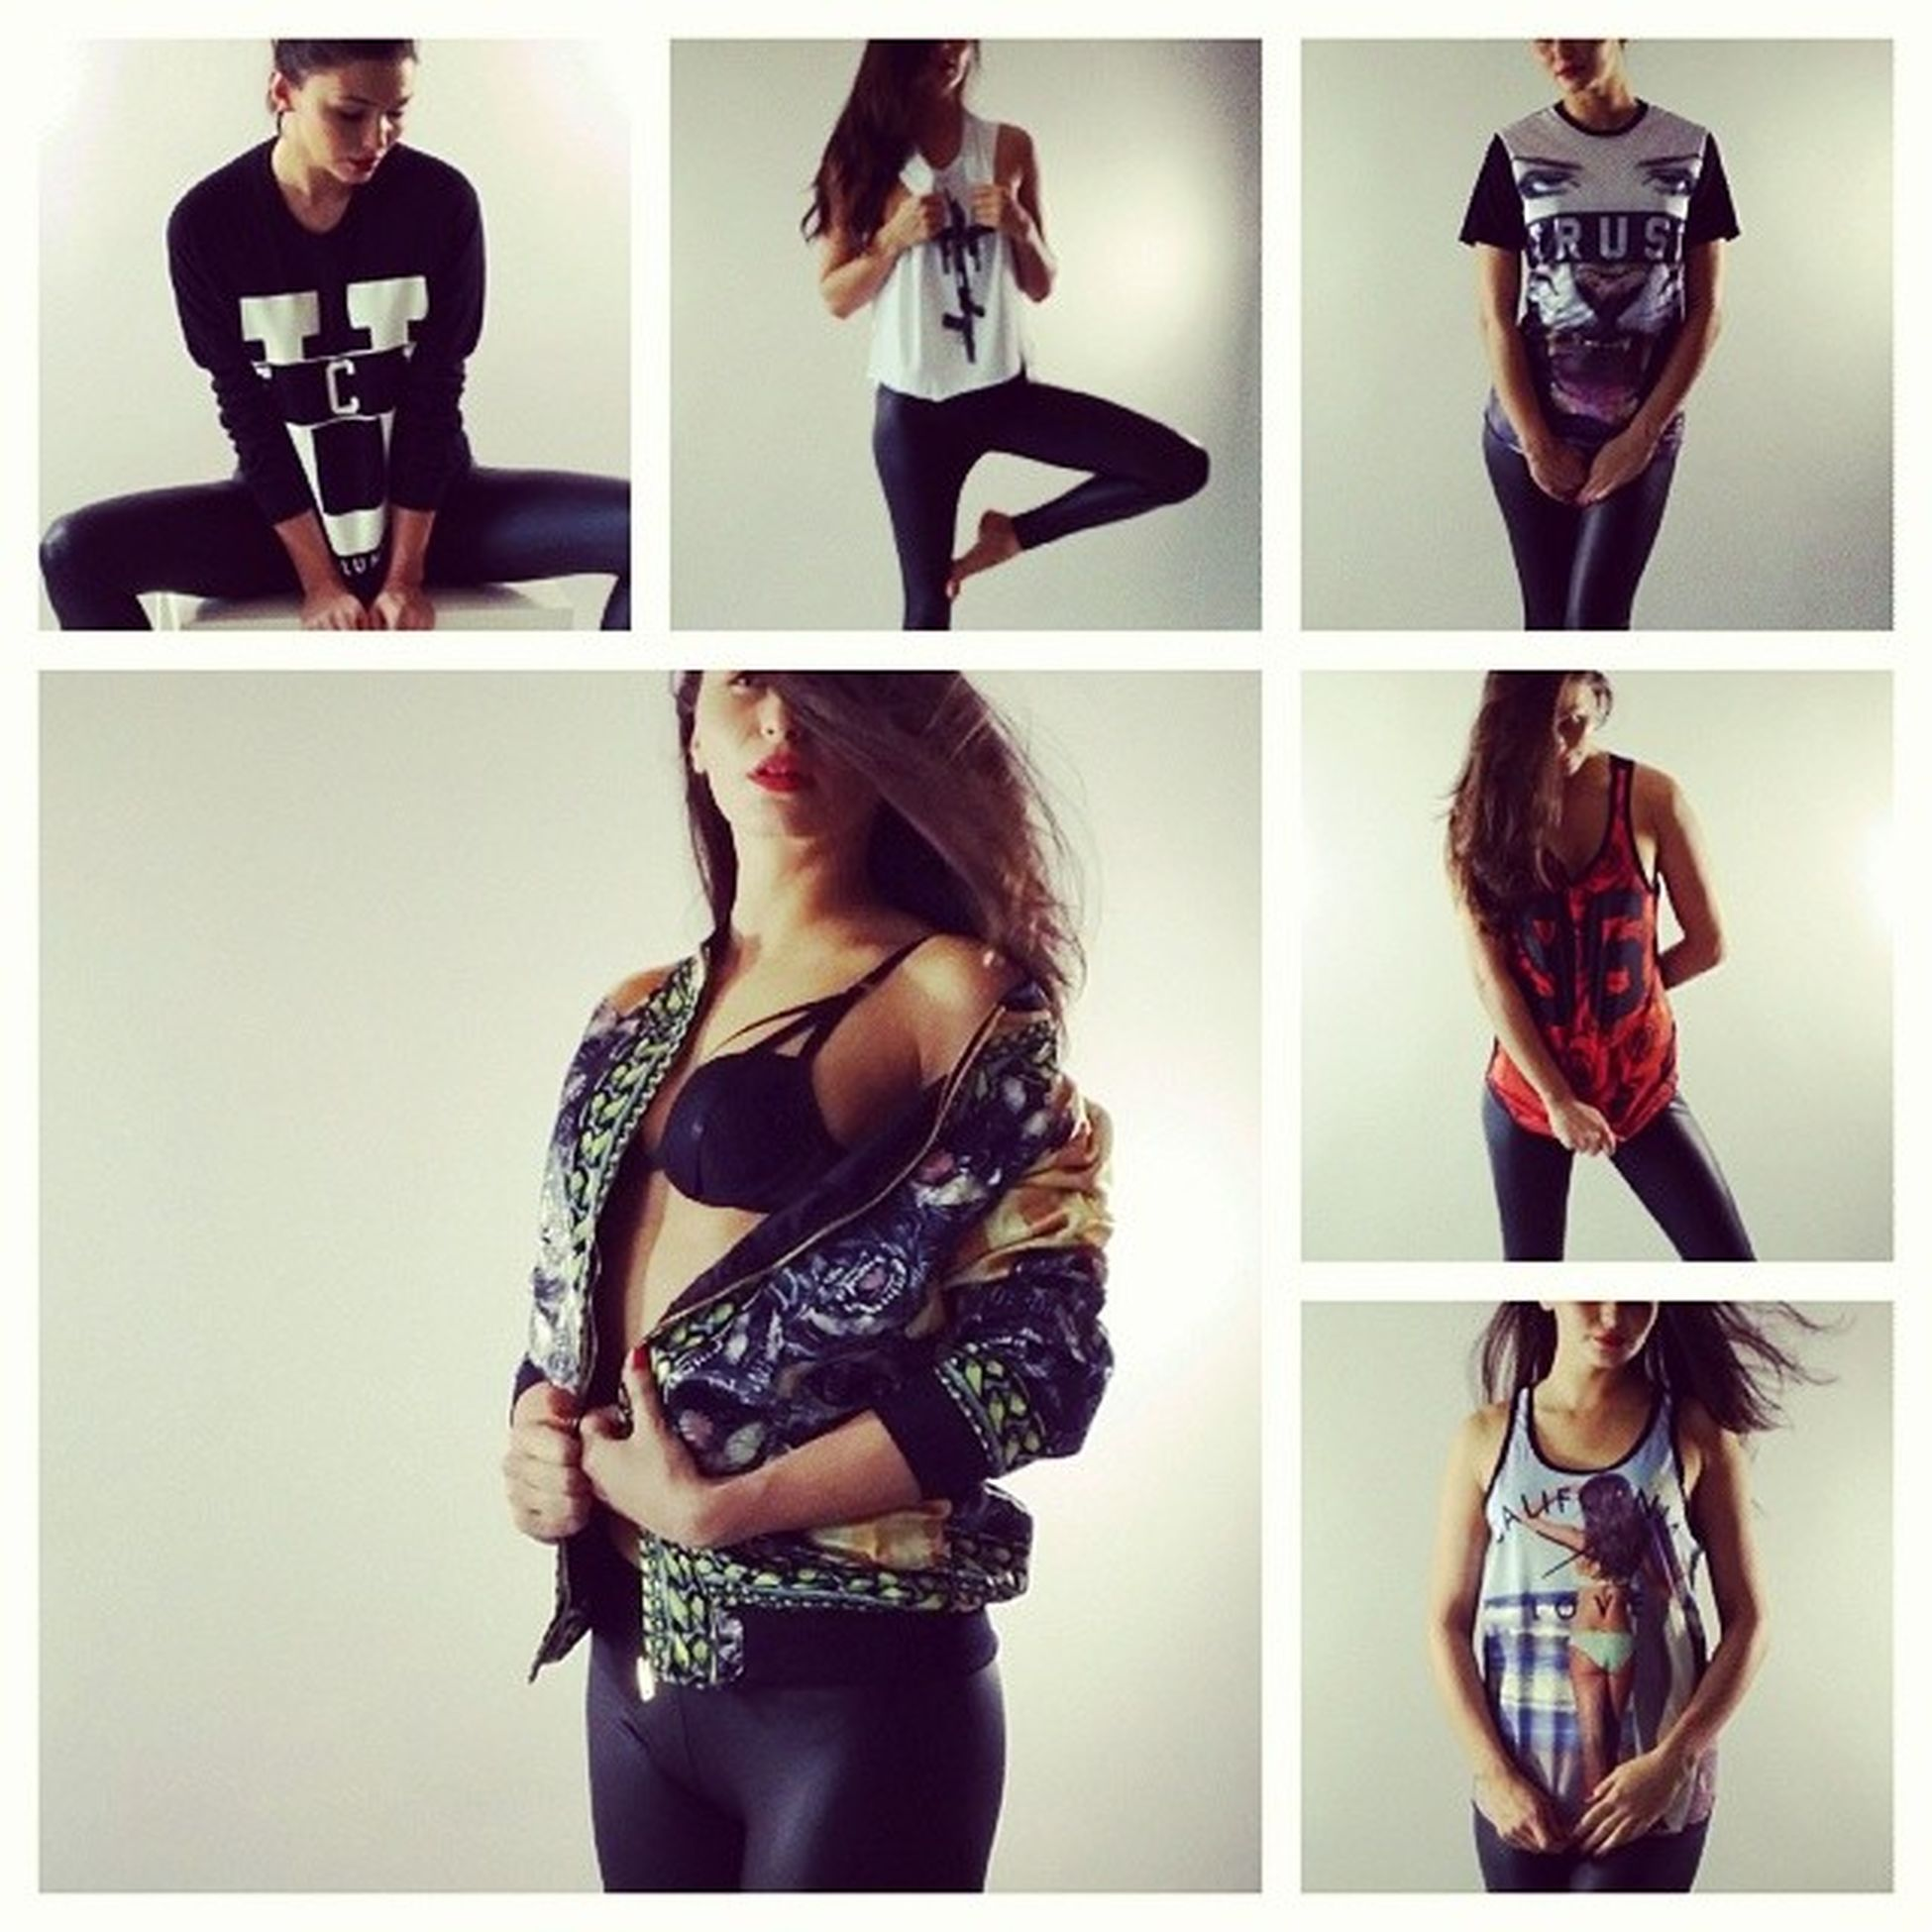 Stylelords e-shop photoshoot COMIMG SOON!! @michakoh @abdu_hd @conniehozak @fugikar